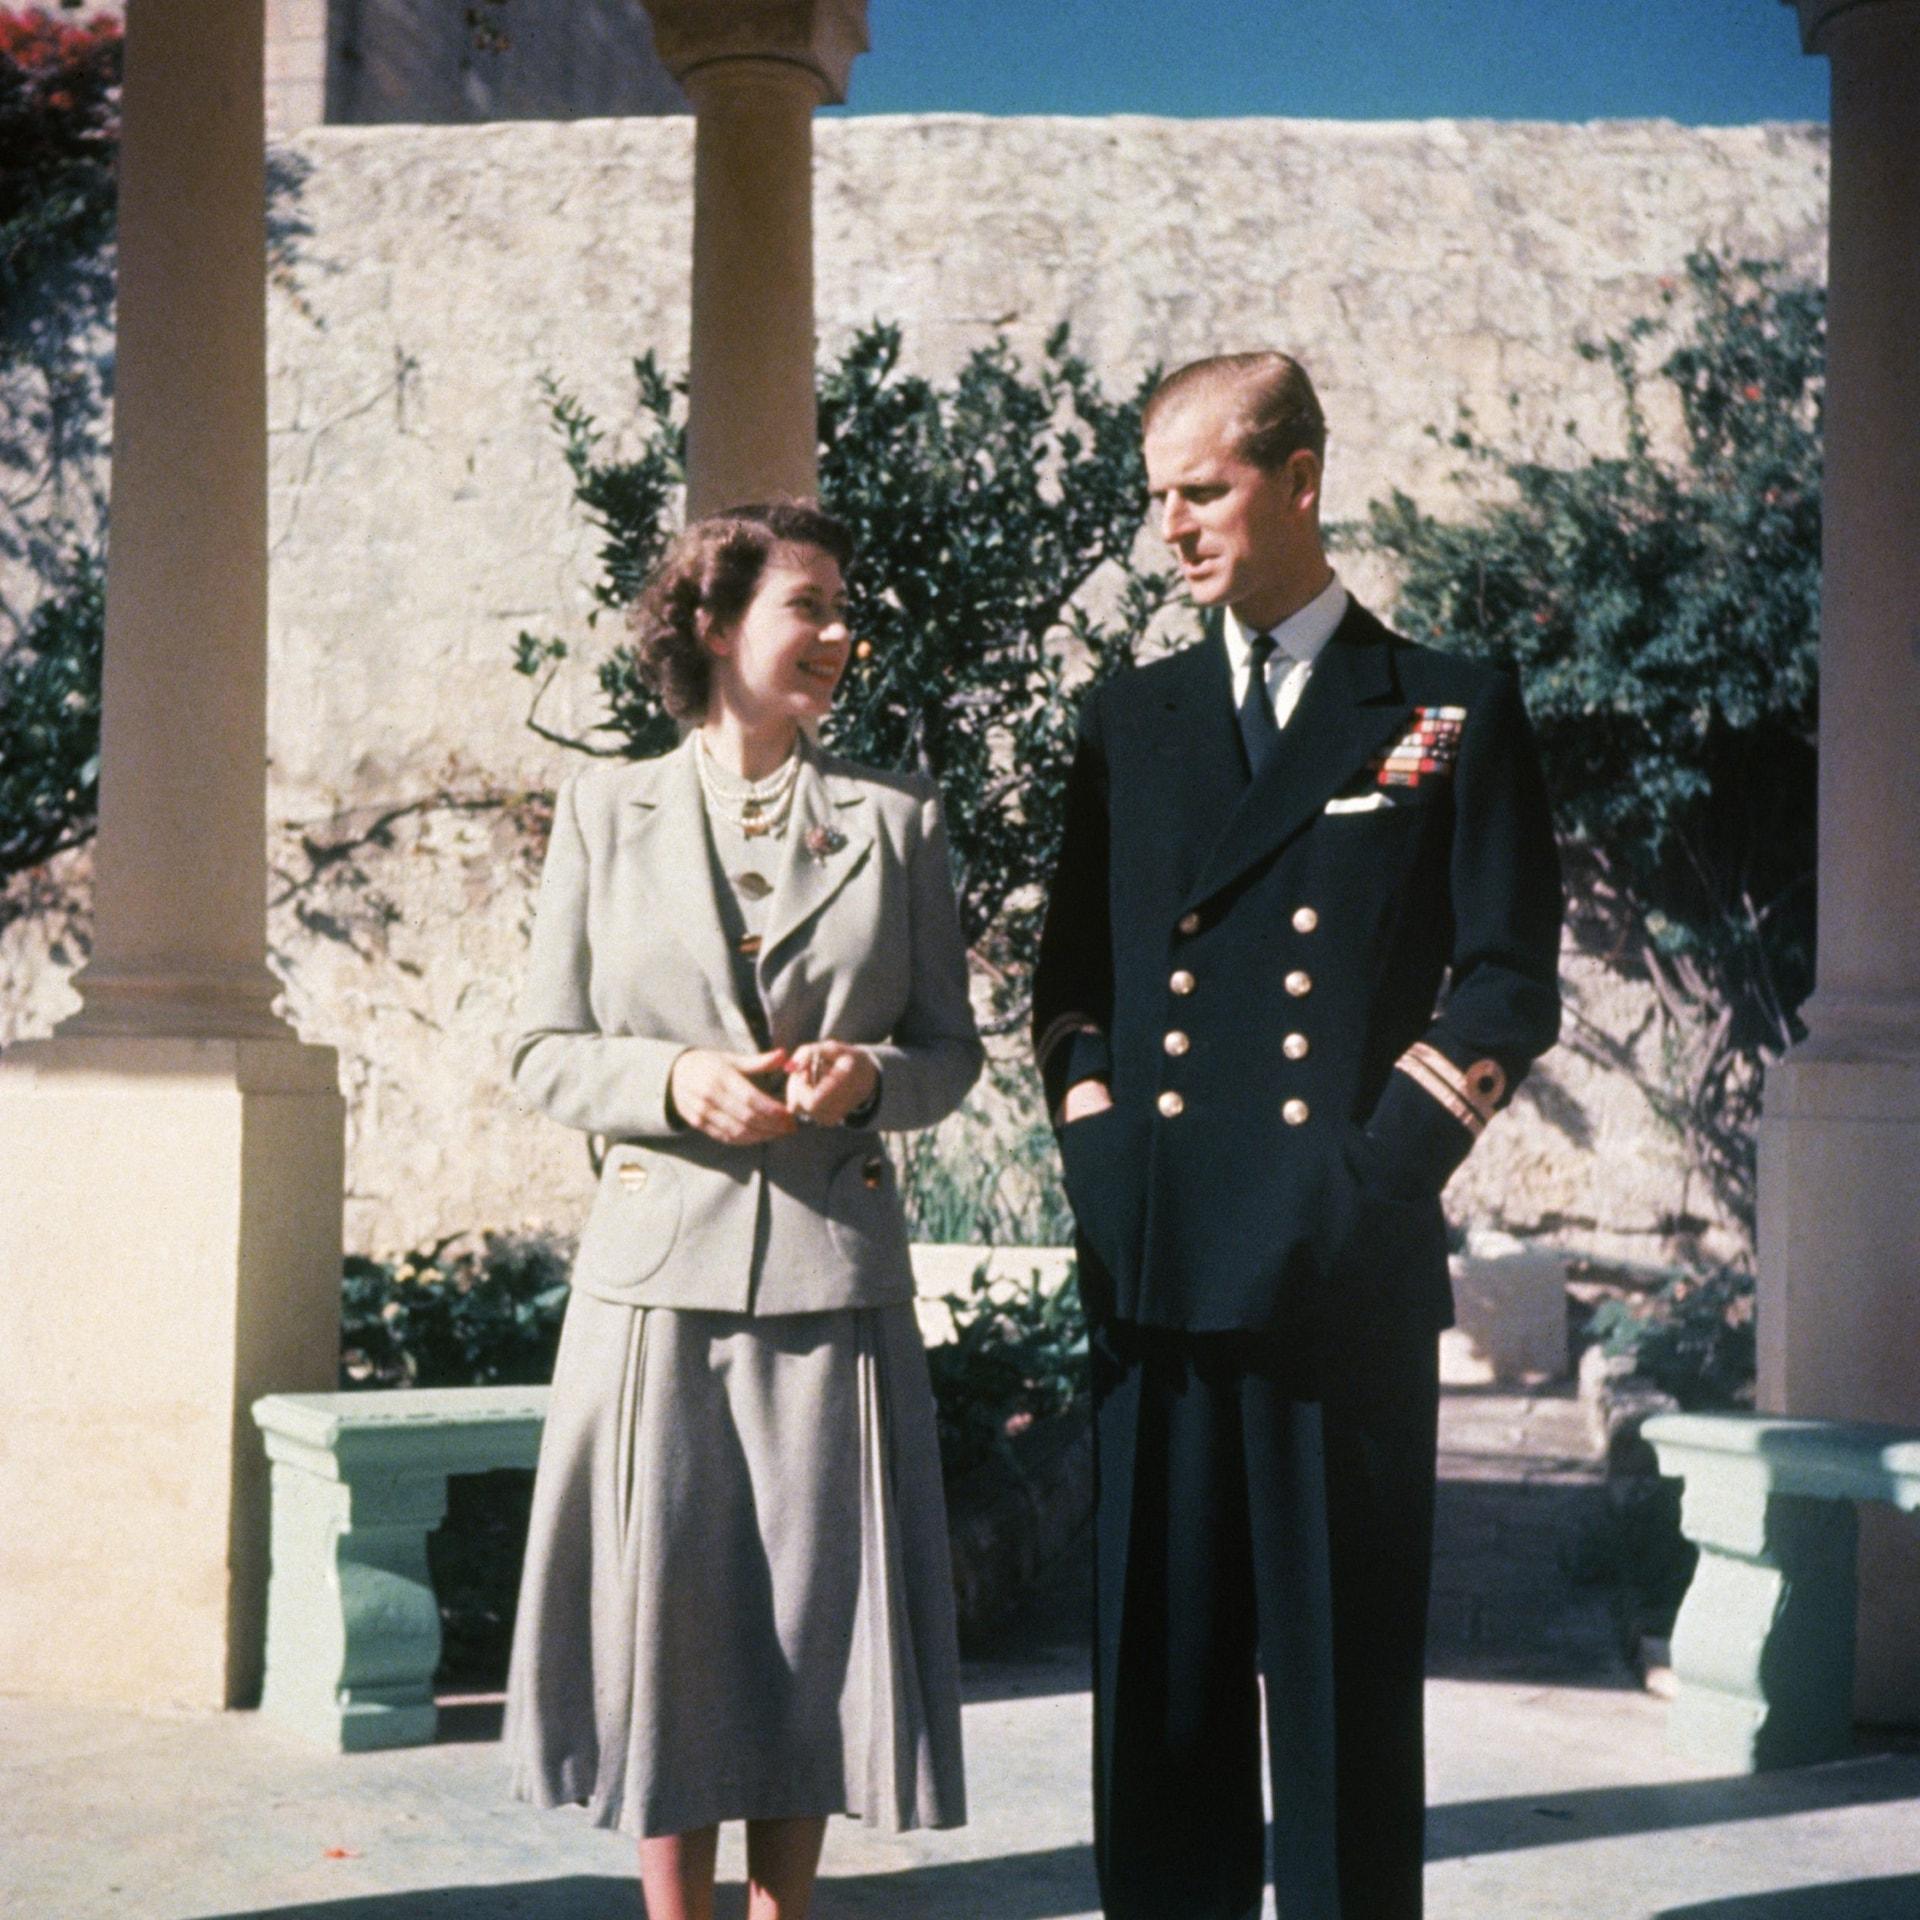 Prince Philip in Royal Navy Uniform on honeymoon in malta 1947